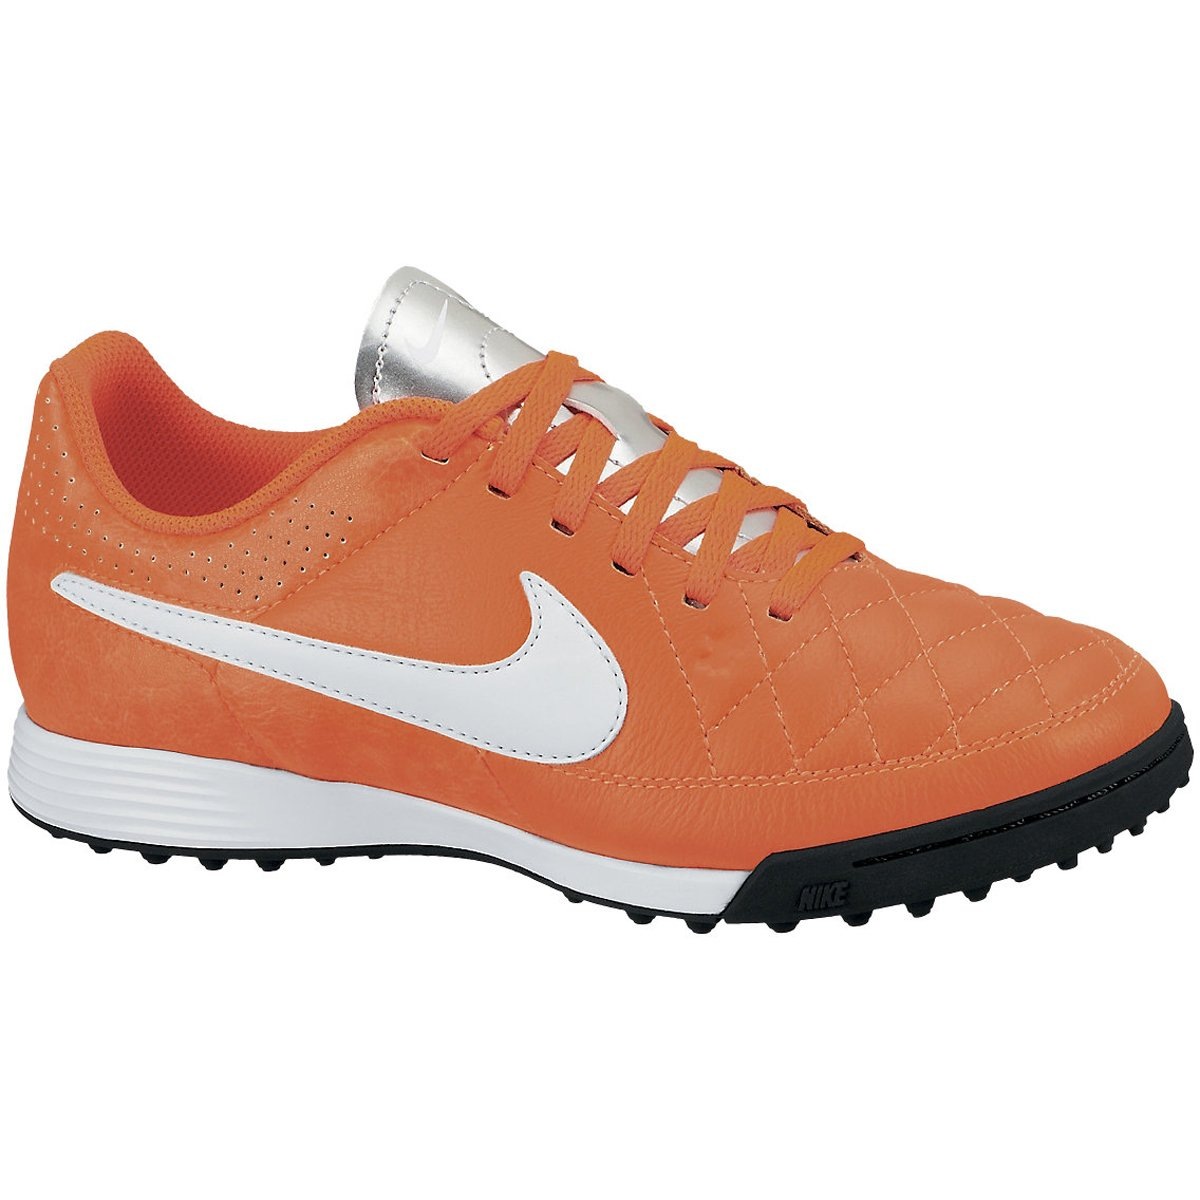 ea3f0f75e6 Chuteira Nike Tiempo Gênio Leather TF Society Infantil - Compre Agora